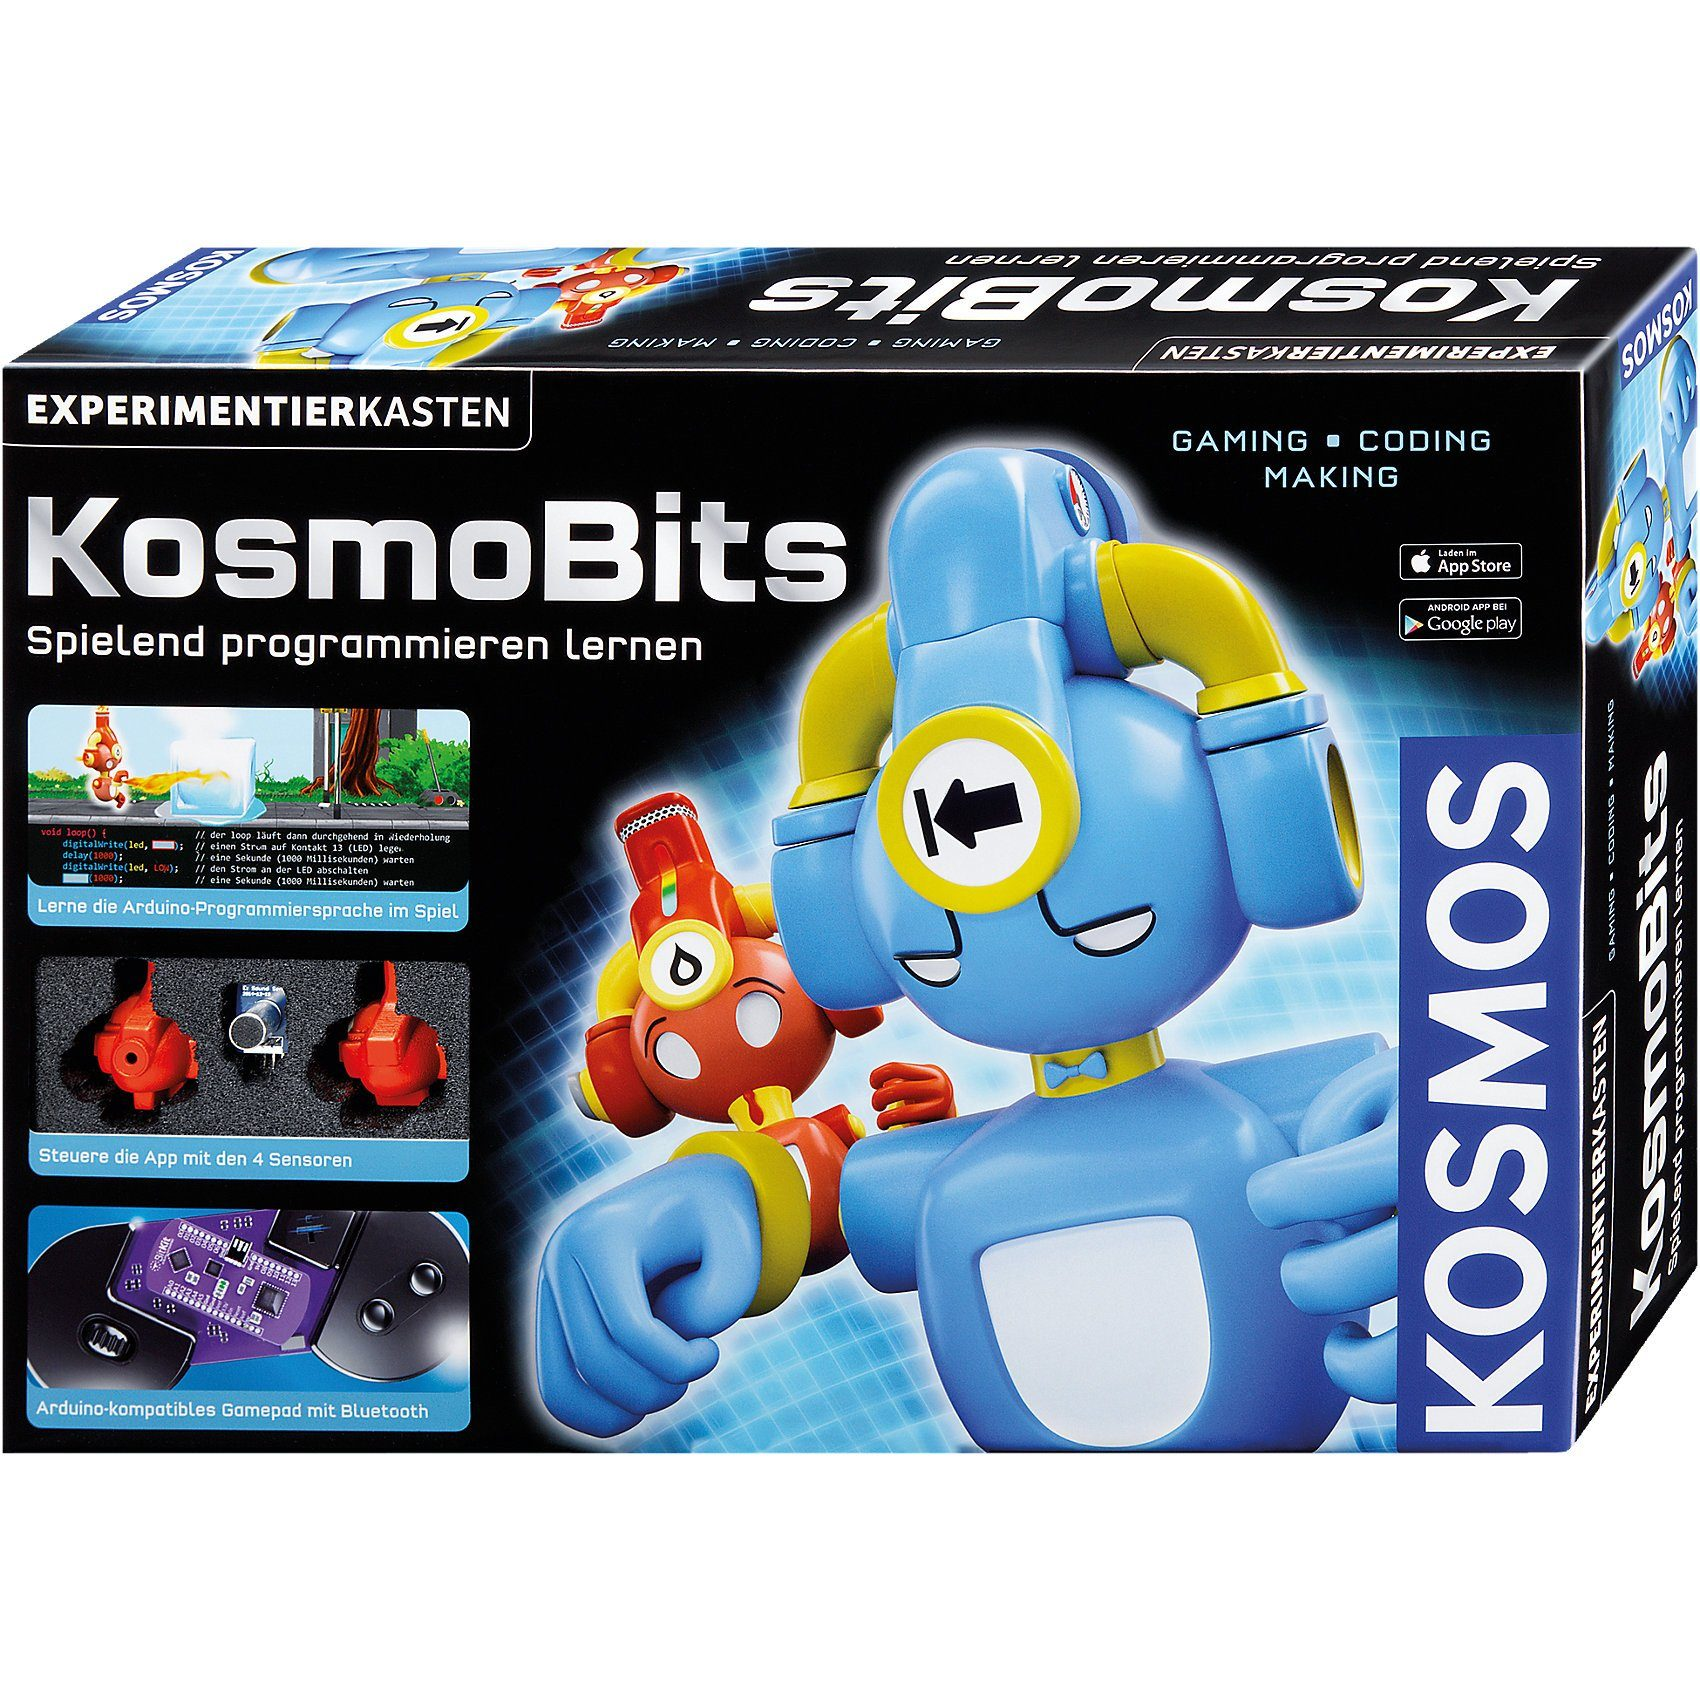 Kosmos Experimentierkasten KosmoBits